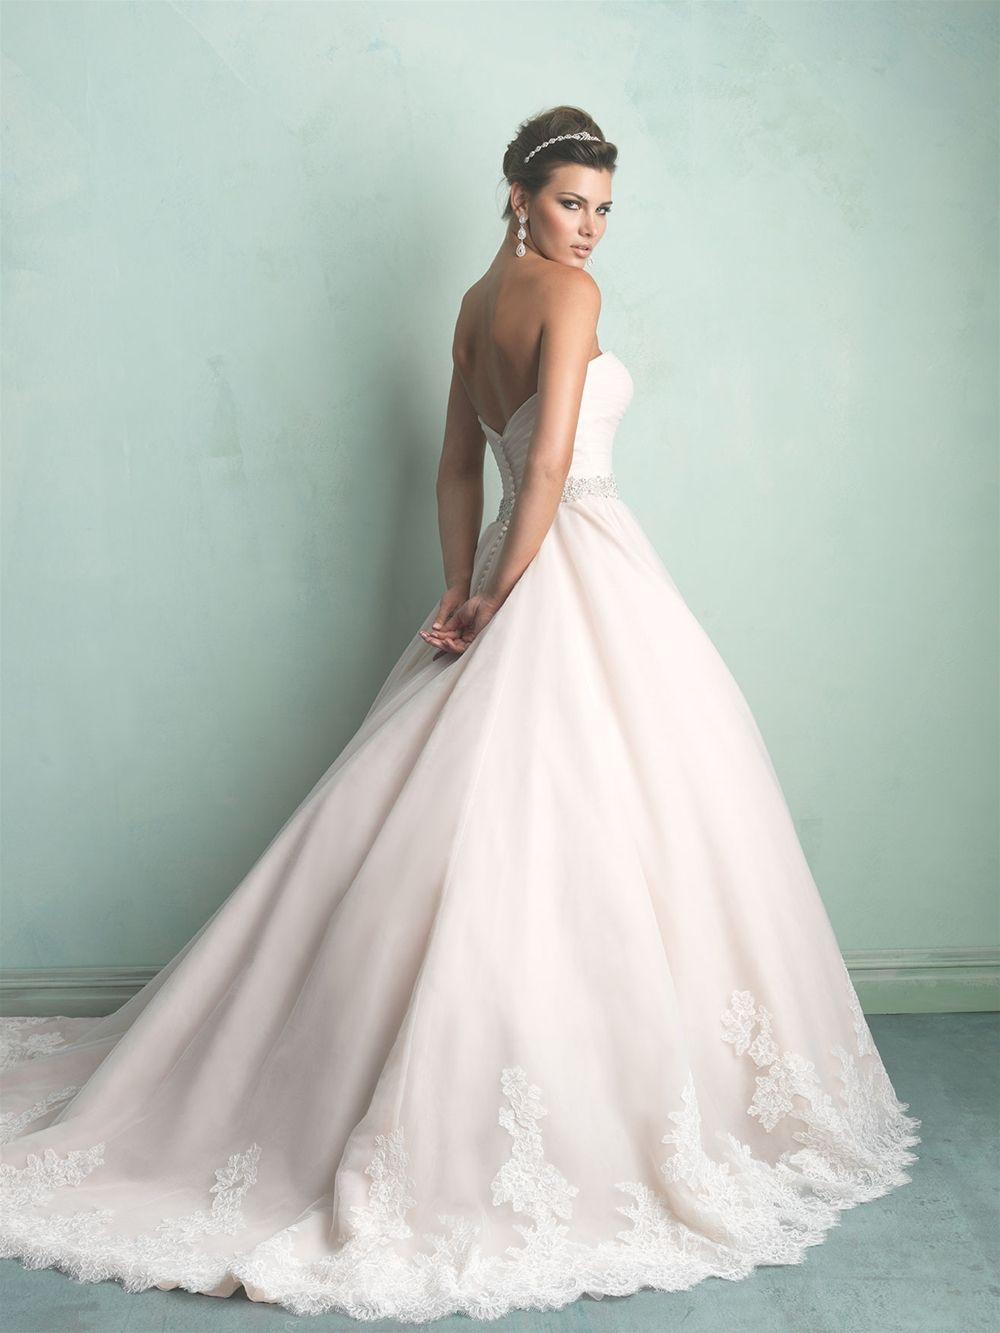 Fine Wedding Gown Design 2014 Ideas - Wedding Ideas - memiocall.com